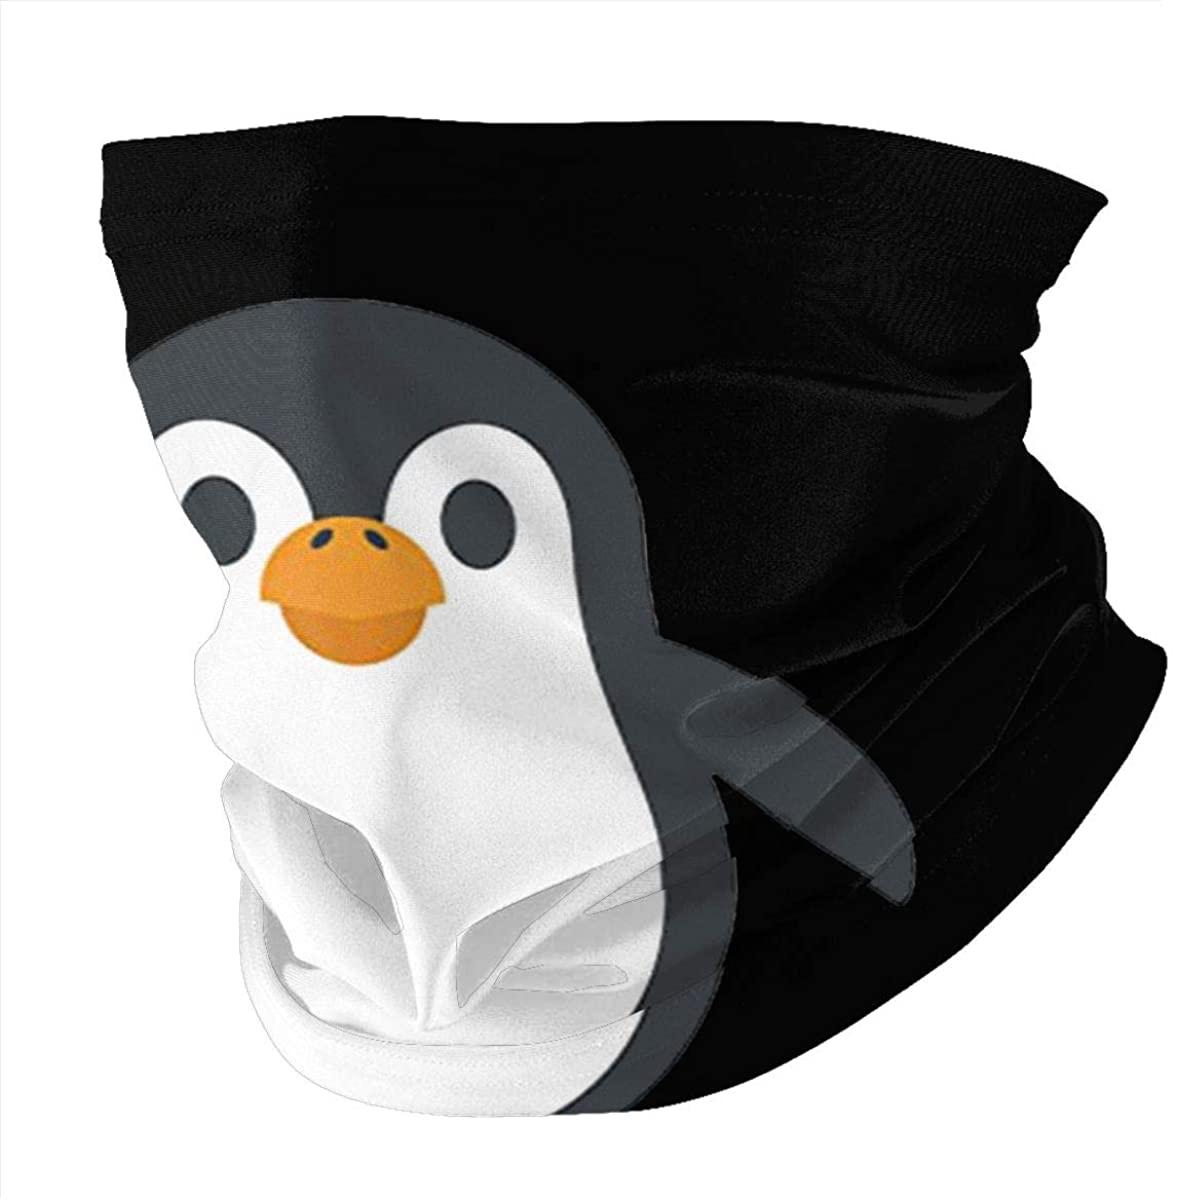 Bandanas Reusable Face Mask For Men Women Penguin Print Half Face Neck Gaiter